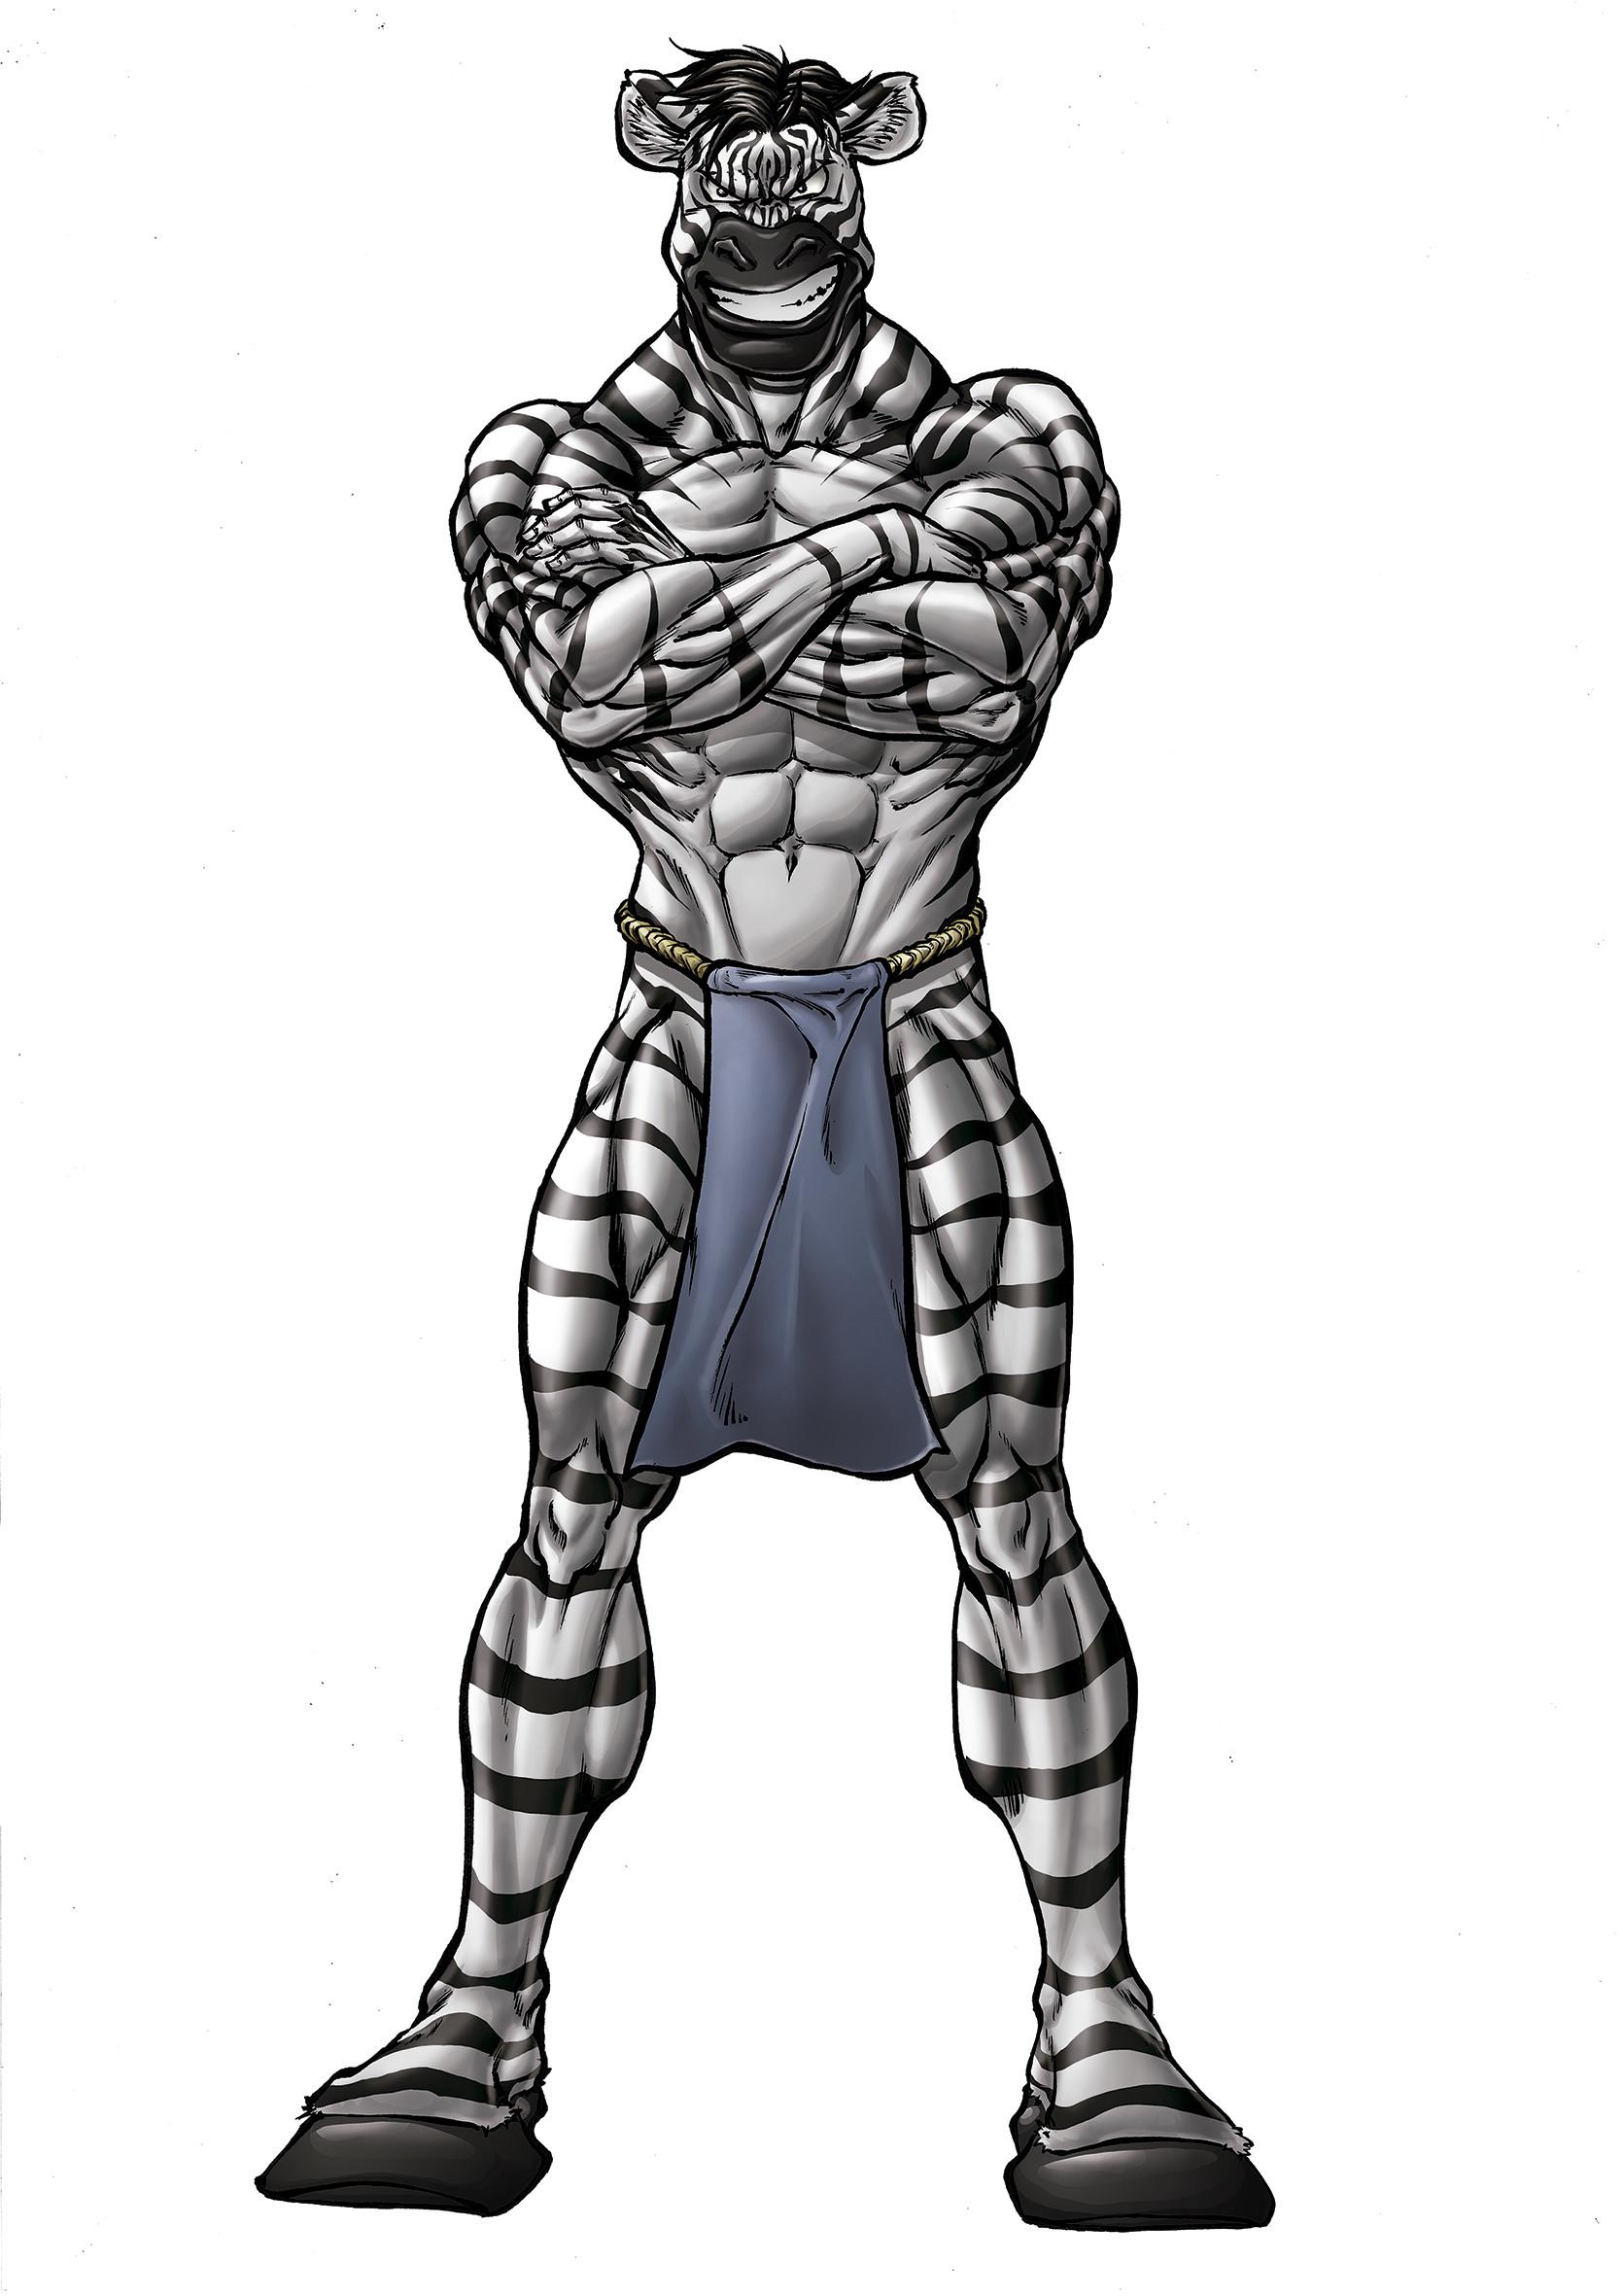 Gustavo melo zebra bracos cruzados jpg